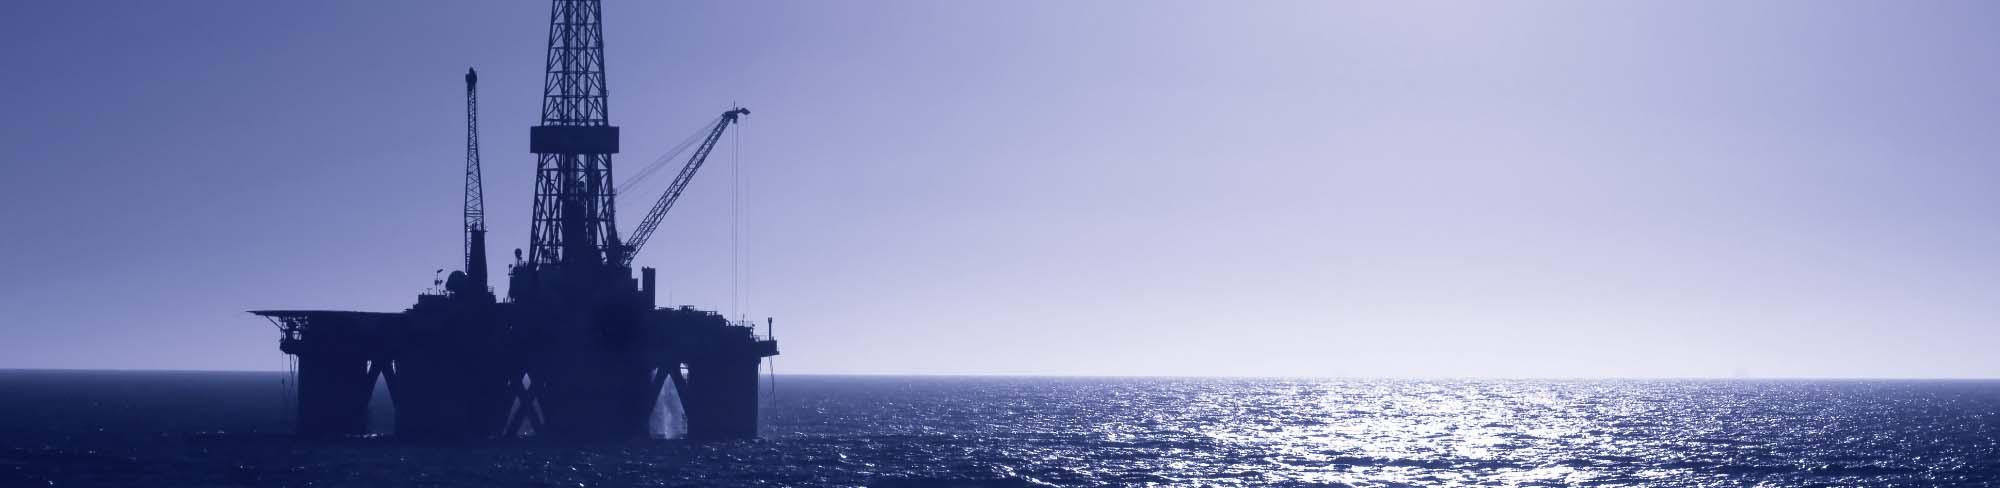 Oil__Gas_Image_2000x488.jpg